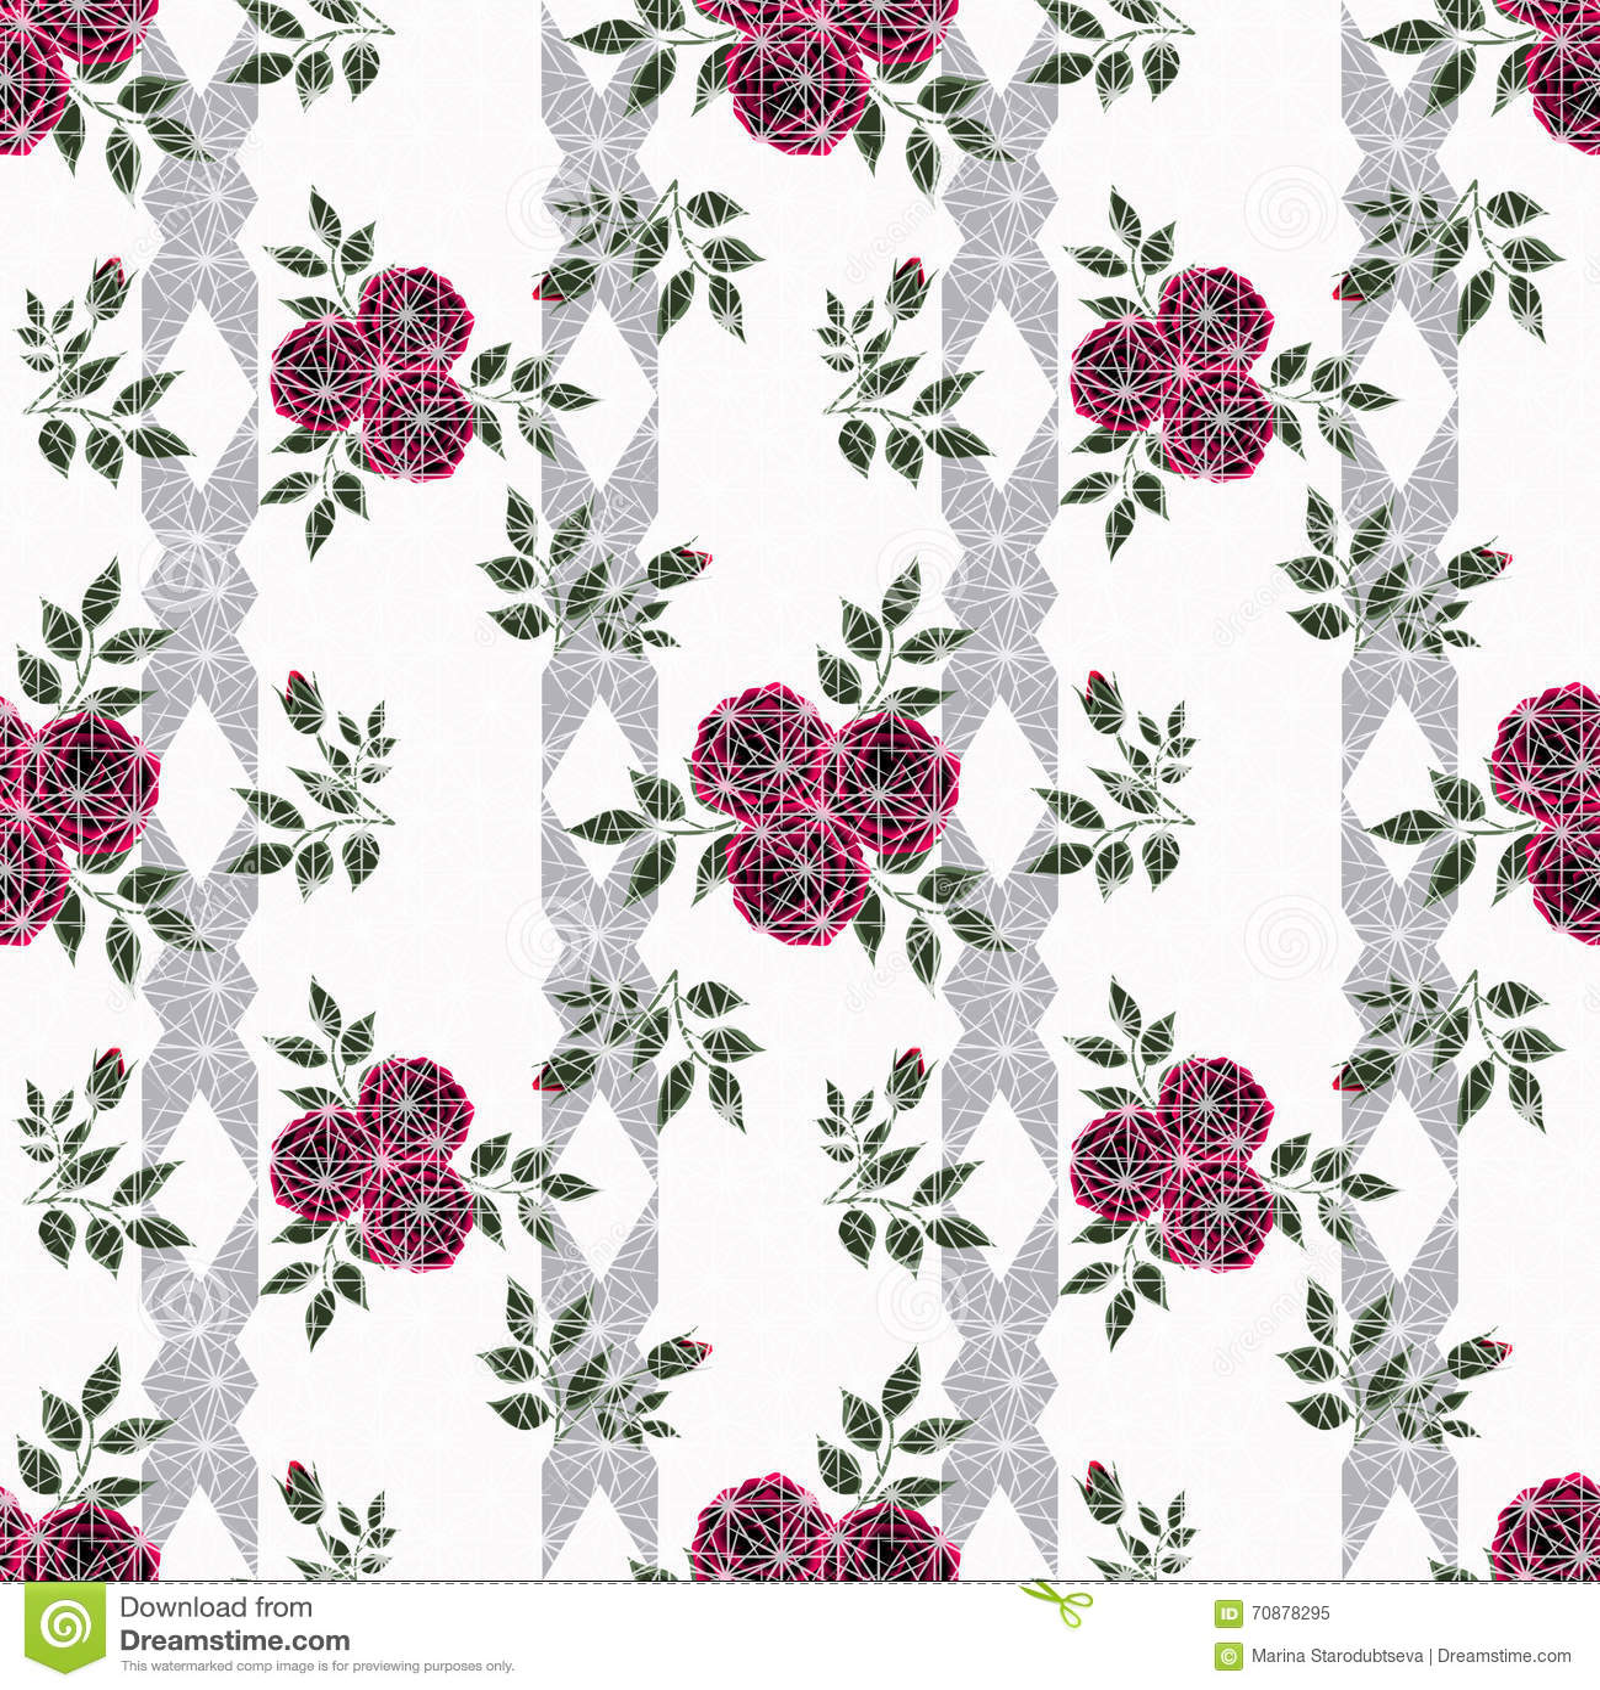 Floral seamless pattern cute cartoon flowers white stripe download floral seamless pattern cute cartoon flowers white stripe background stock illustration illustration of izmirmasajfo